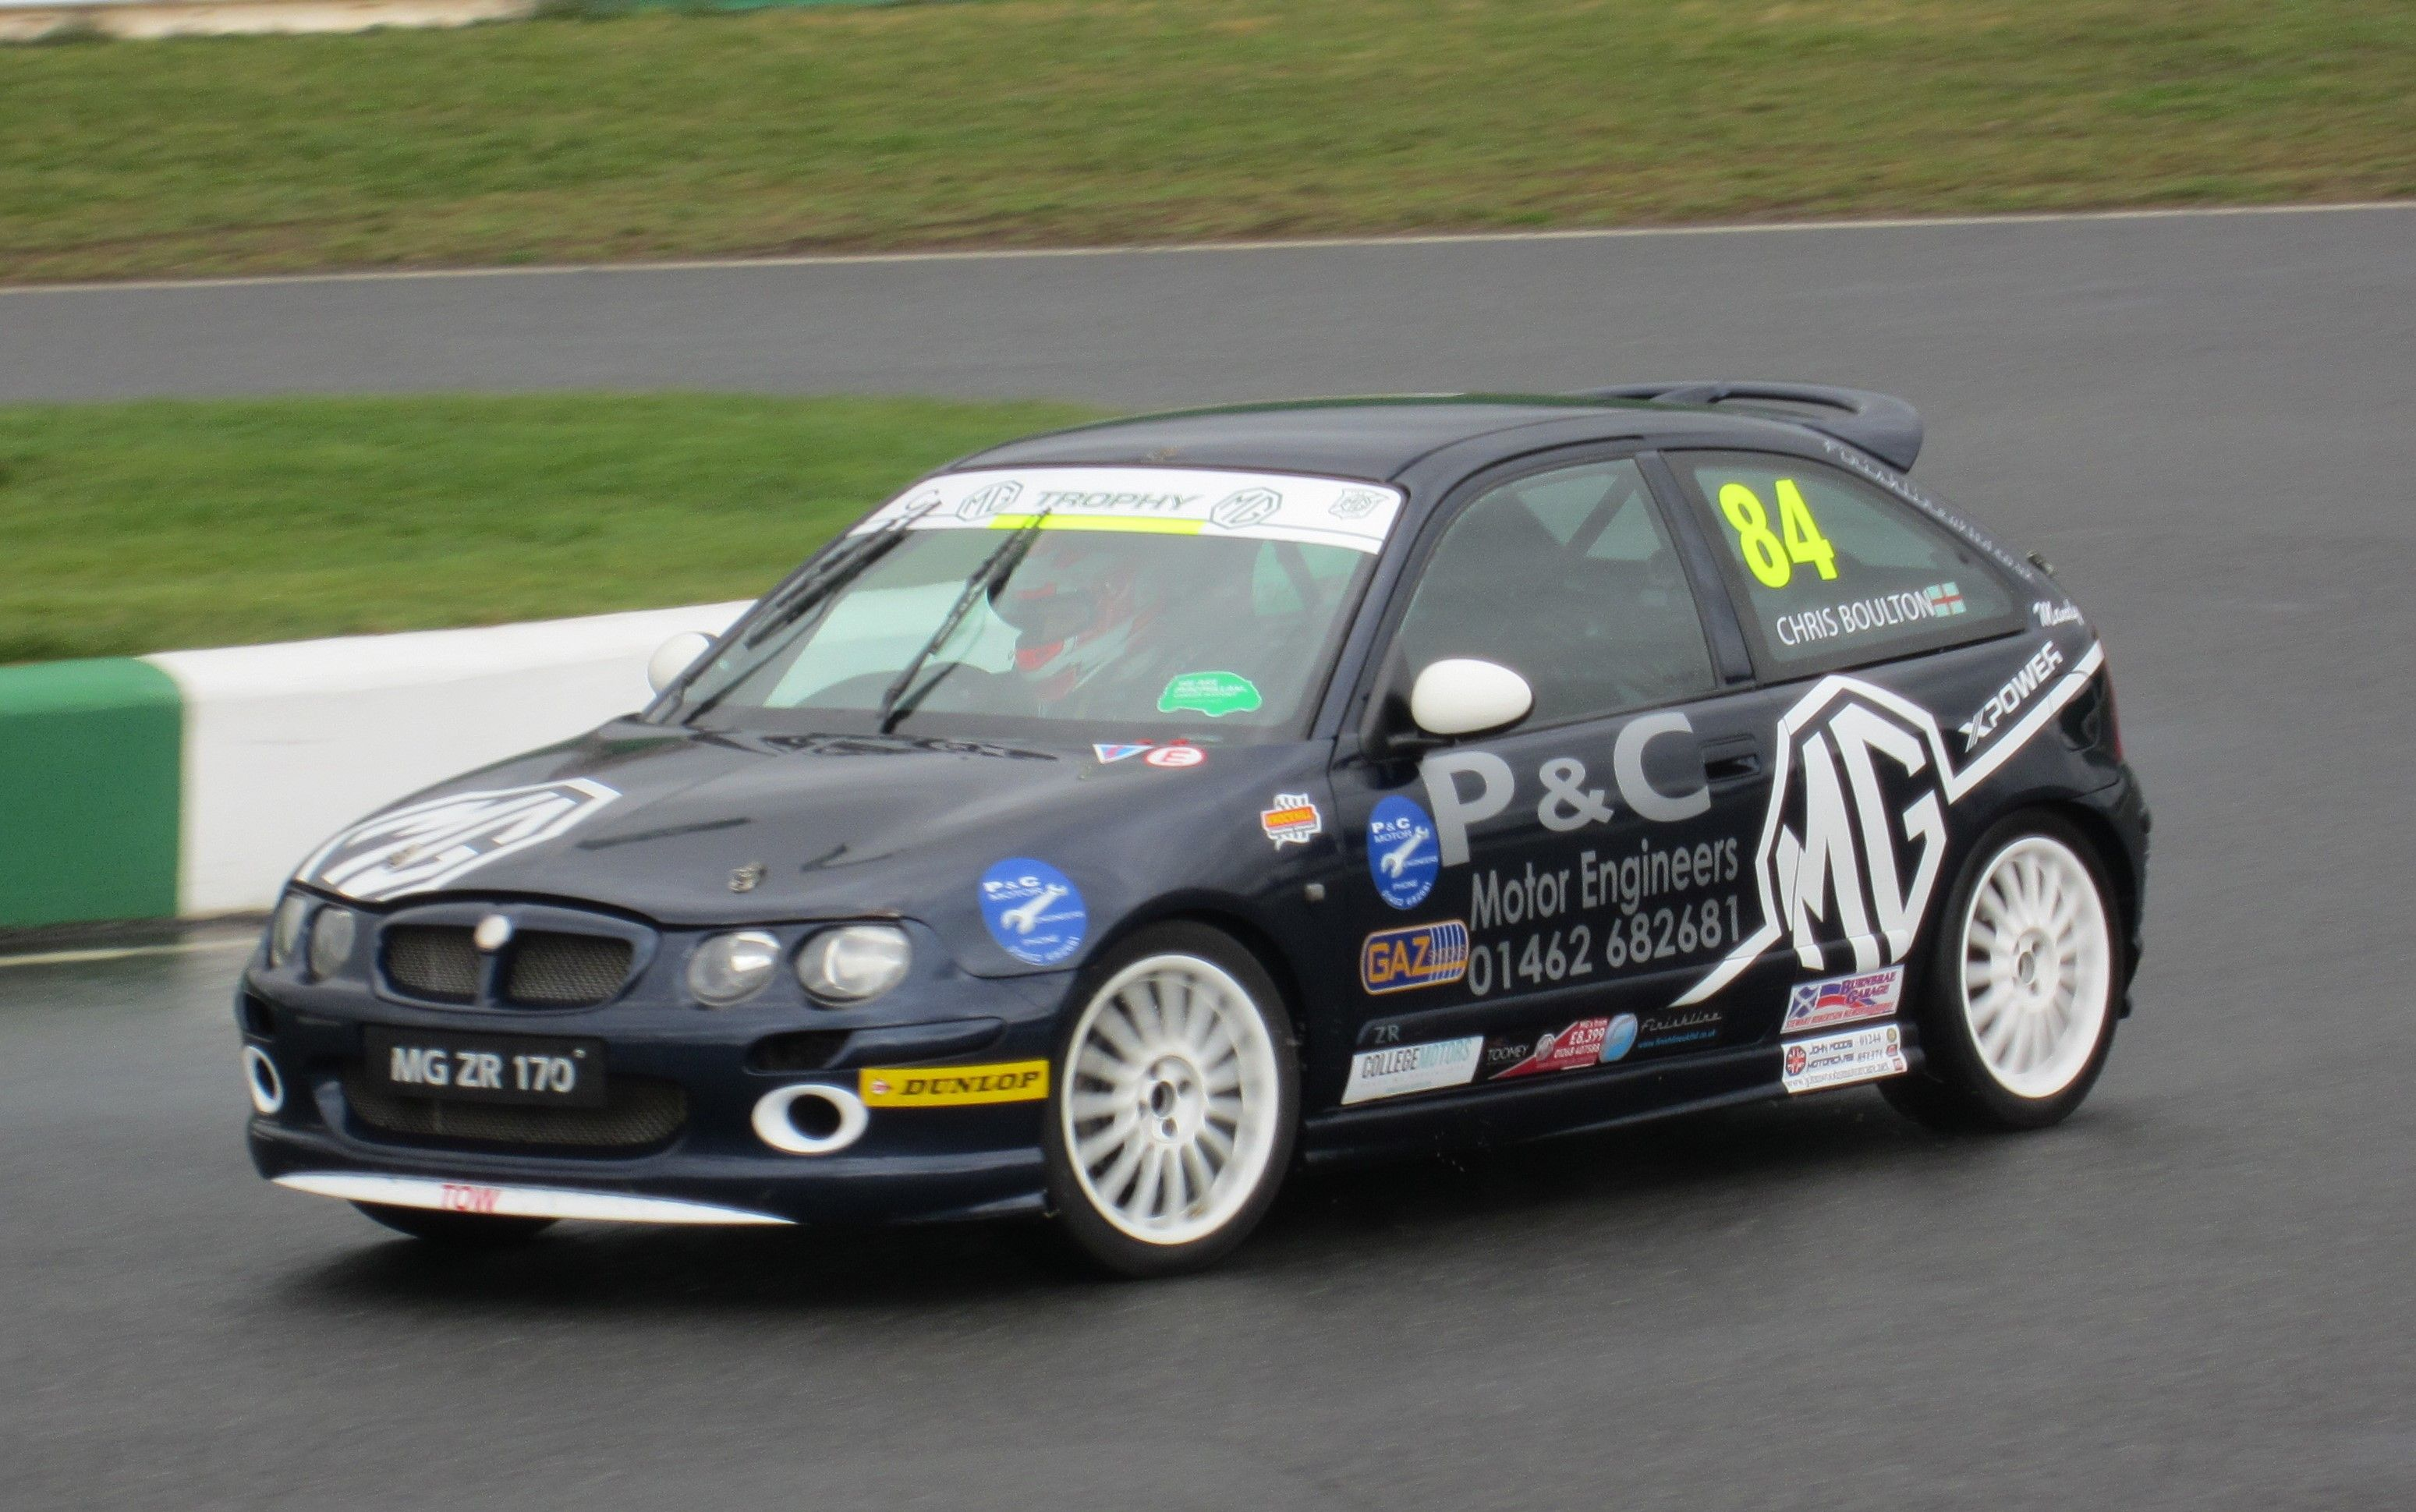 MG Trophy Class C - ZR 170 cars | MGCC Modern MG\'s | Pinterest | Cars